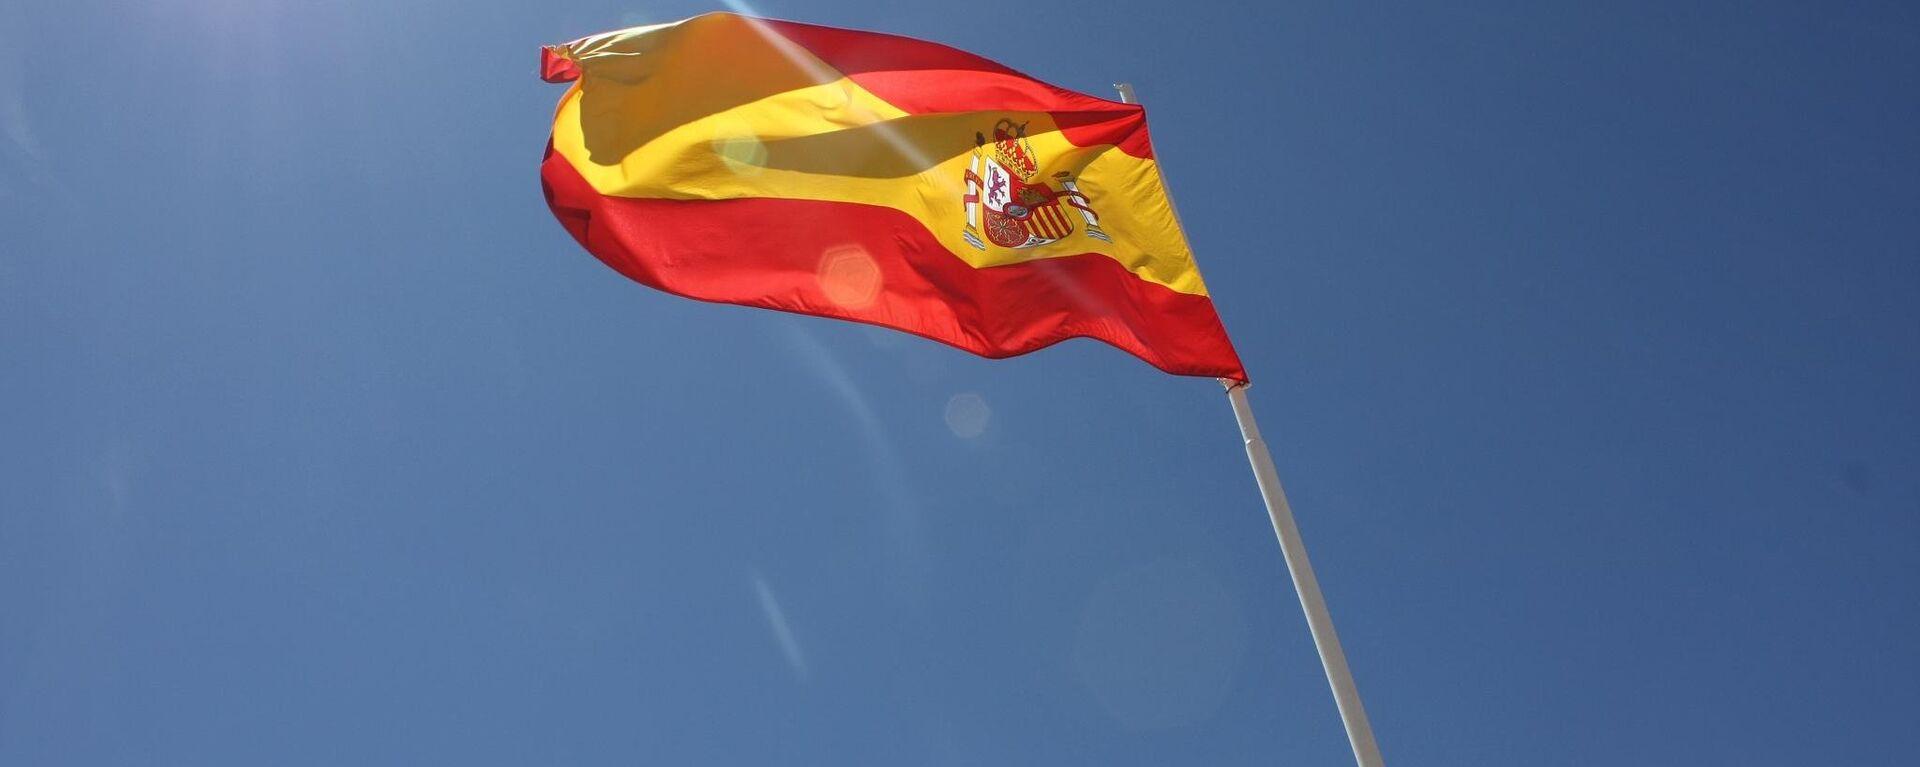 Bandera de España - Sputnik Mundo, 1920, 10.06.2021